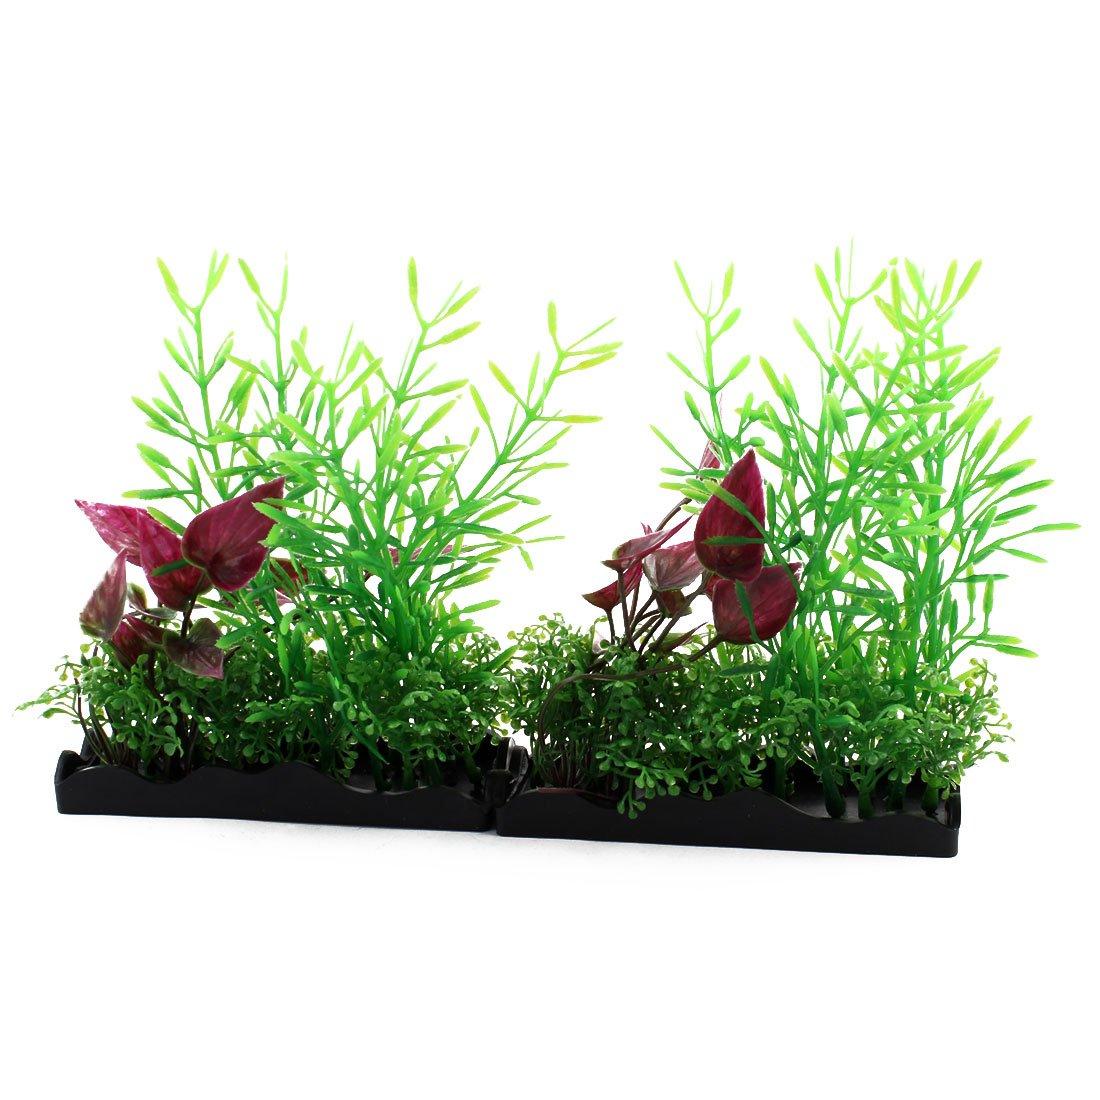 sourcing map Pecera acuático Planta Rectangular de plástico césped Verde Ornamento Púrpura 2pcs: Amazon.es: Productos para mascotas